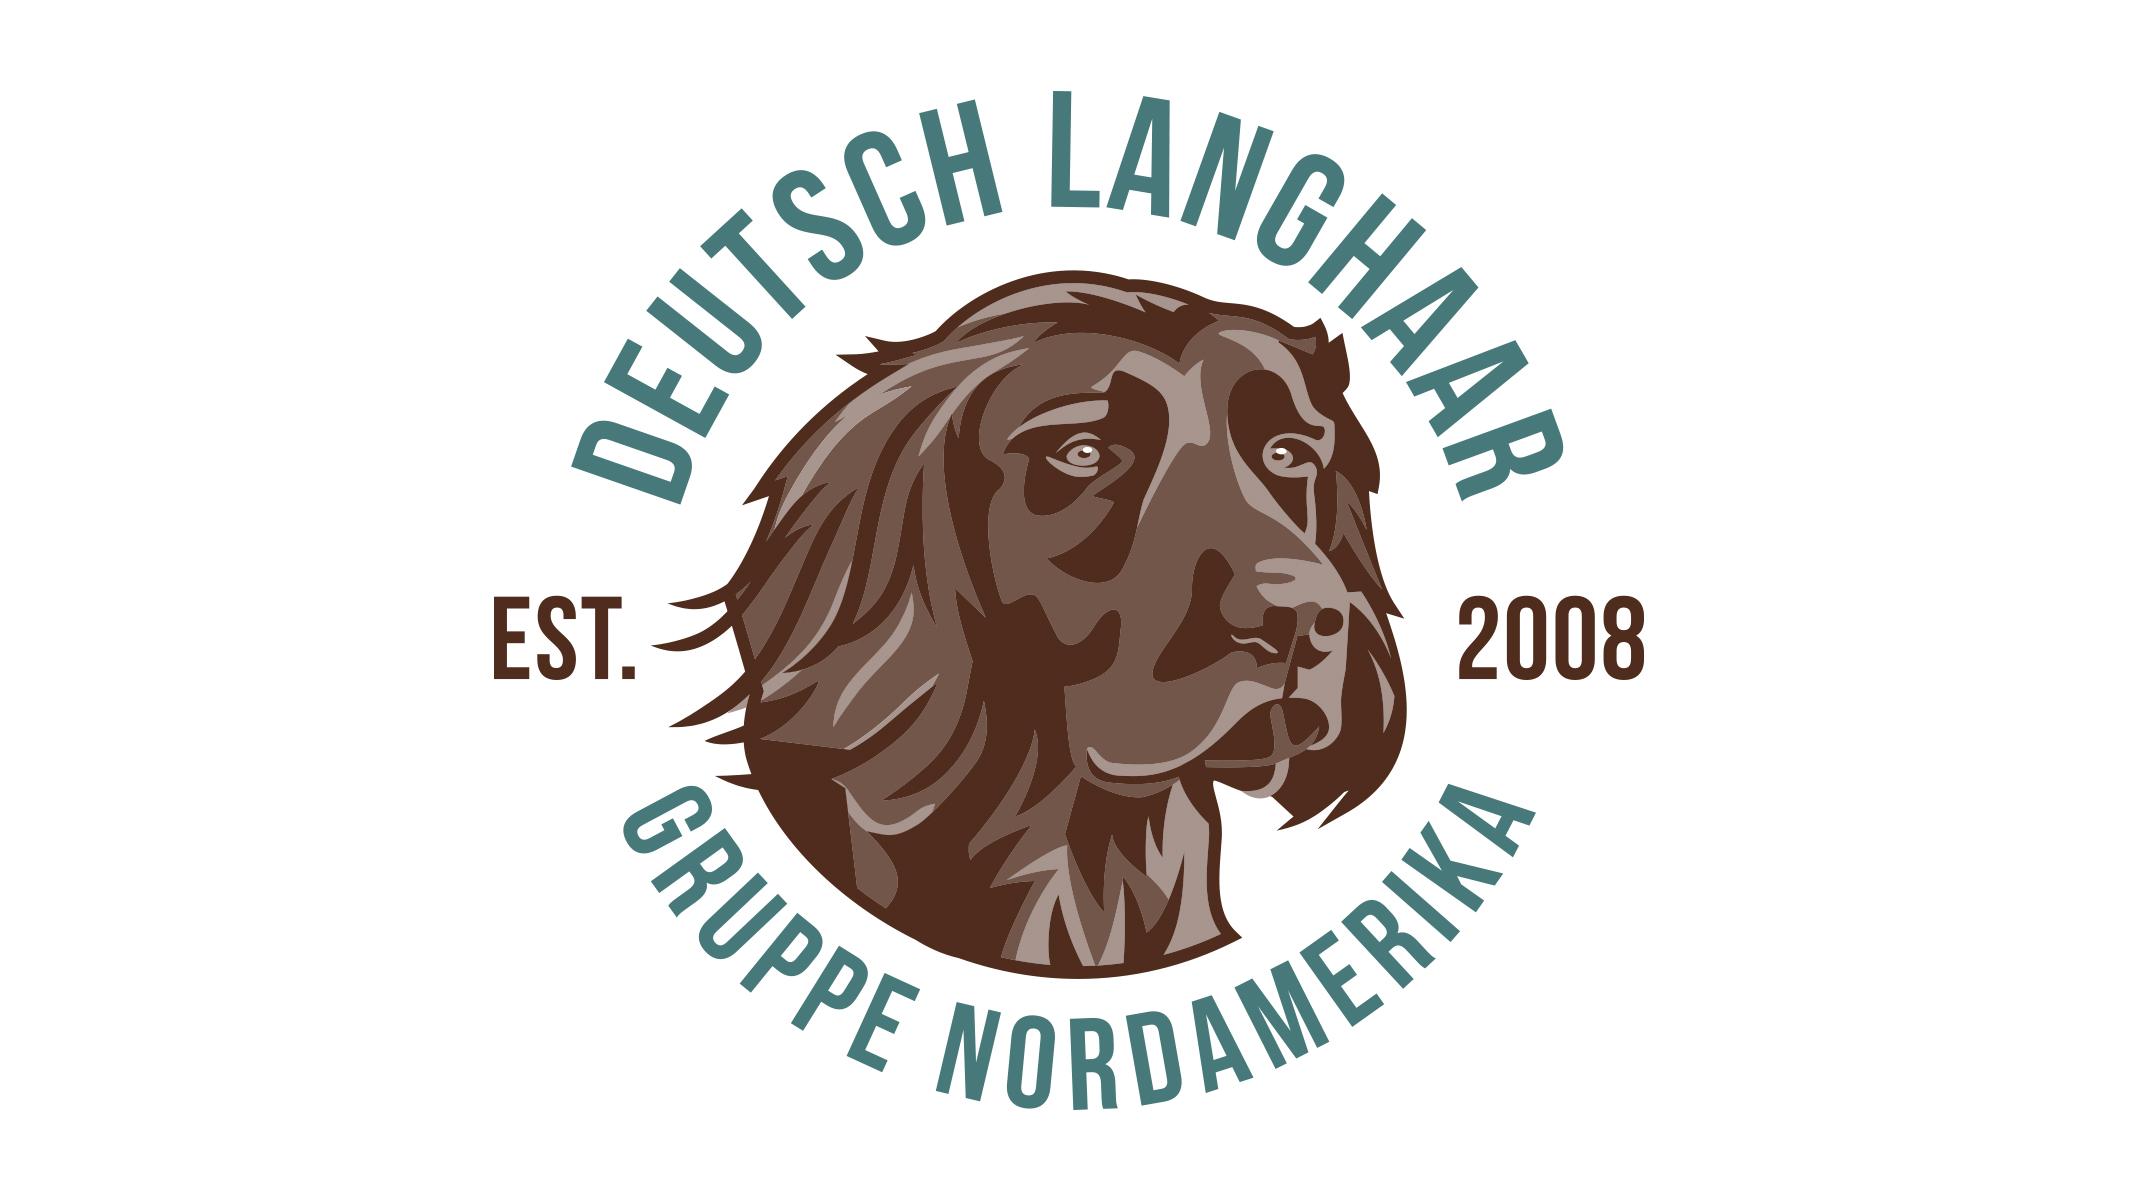 Deutsch Langhaar Gruppe Nordamerika logo